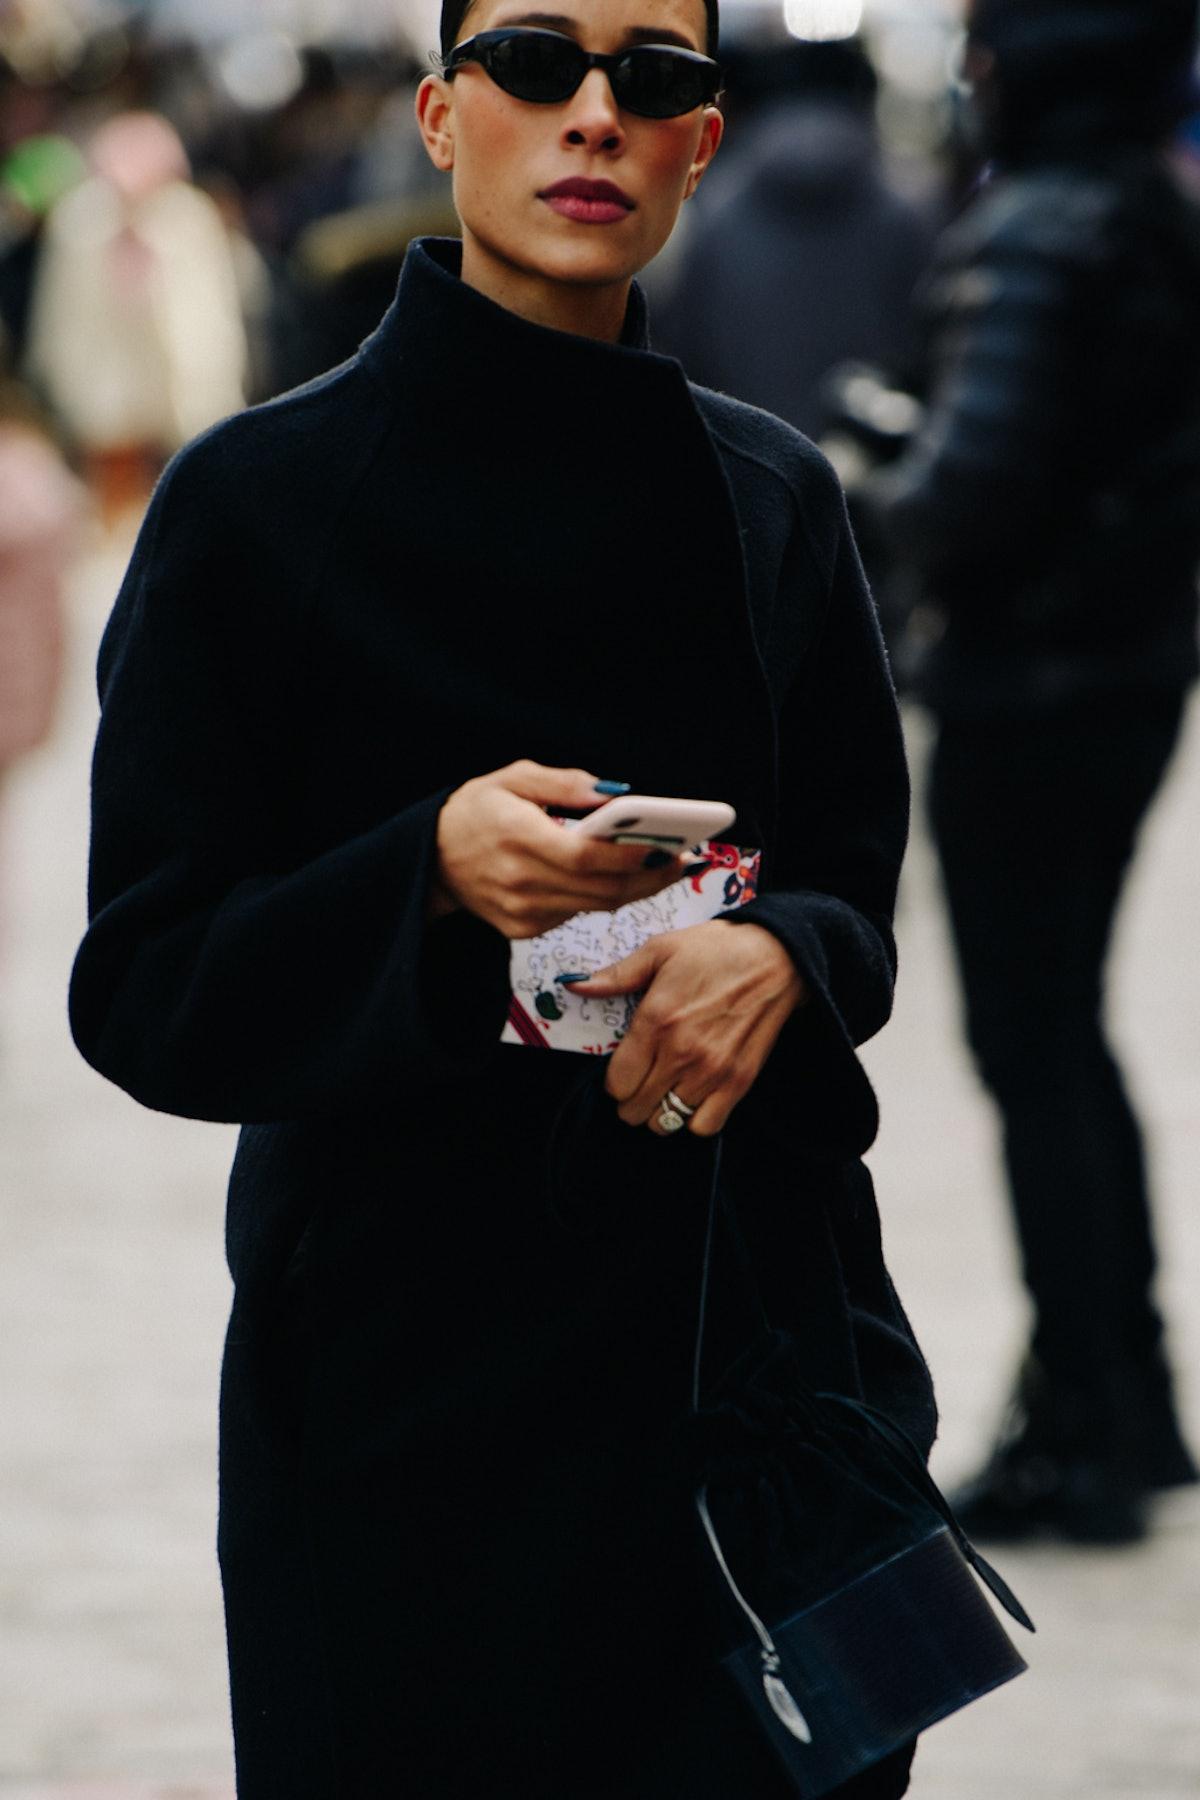 Adam-Katz-Sinding-W-Magazine-New-York-Fashion-Week-Fall-Winter-2019_AKS1762.jpg